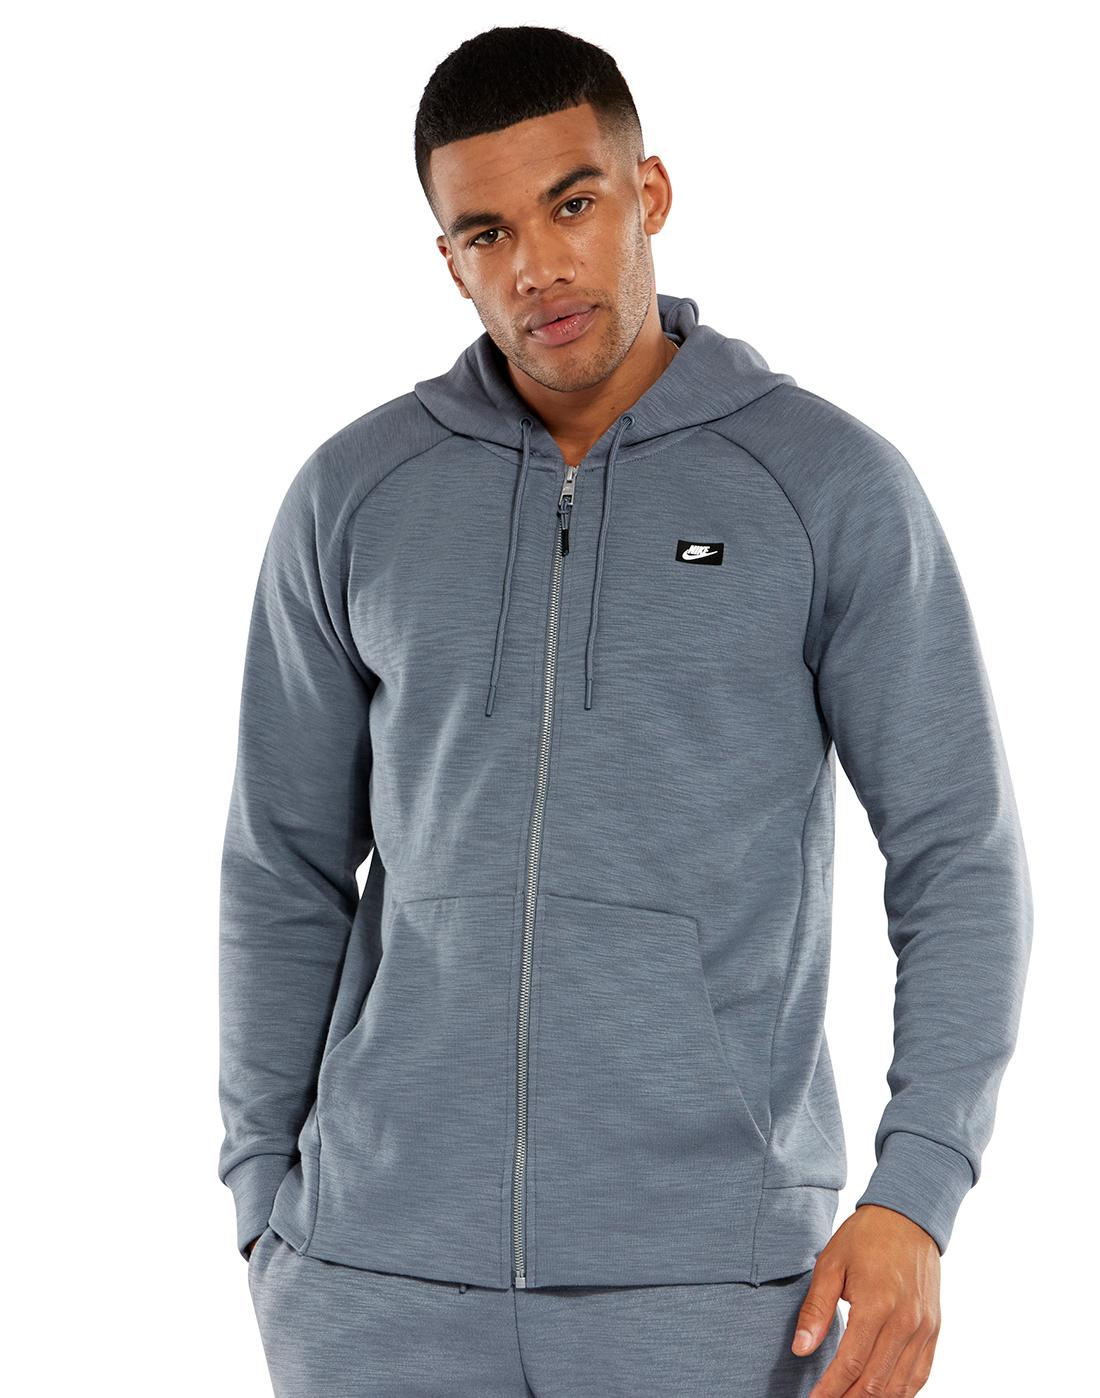 ed18b60d3 Men's Blue Nike Optic Hoodie   Life Style Sports